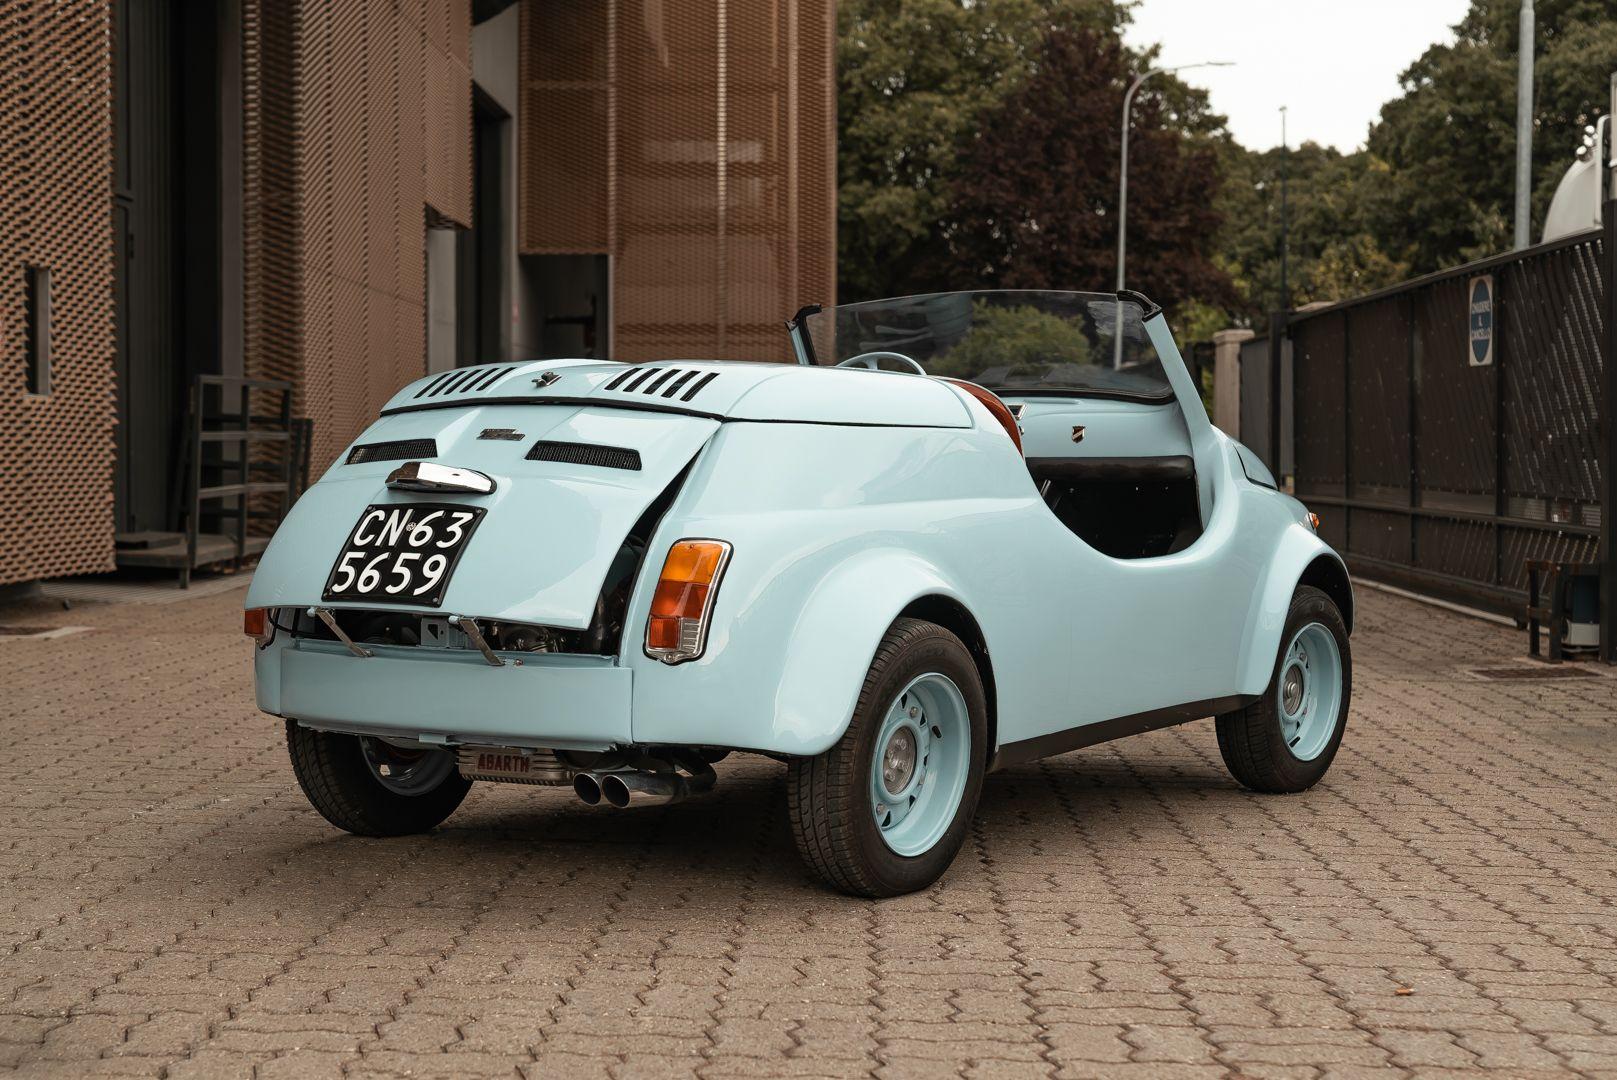 1971 Fiat 500 F Replica Speedster 80058